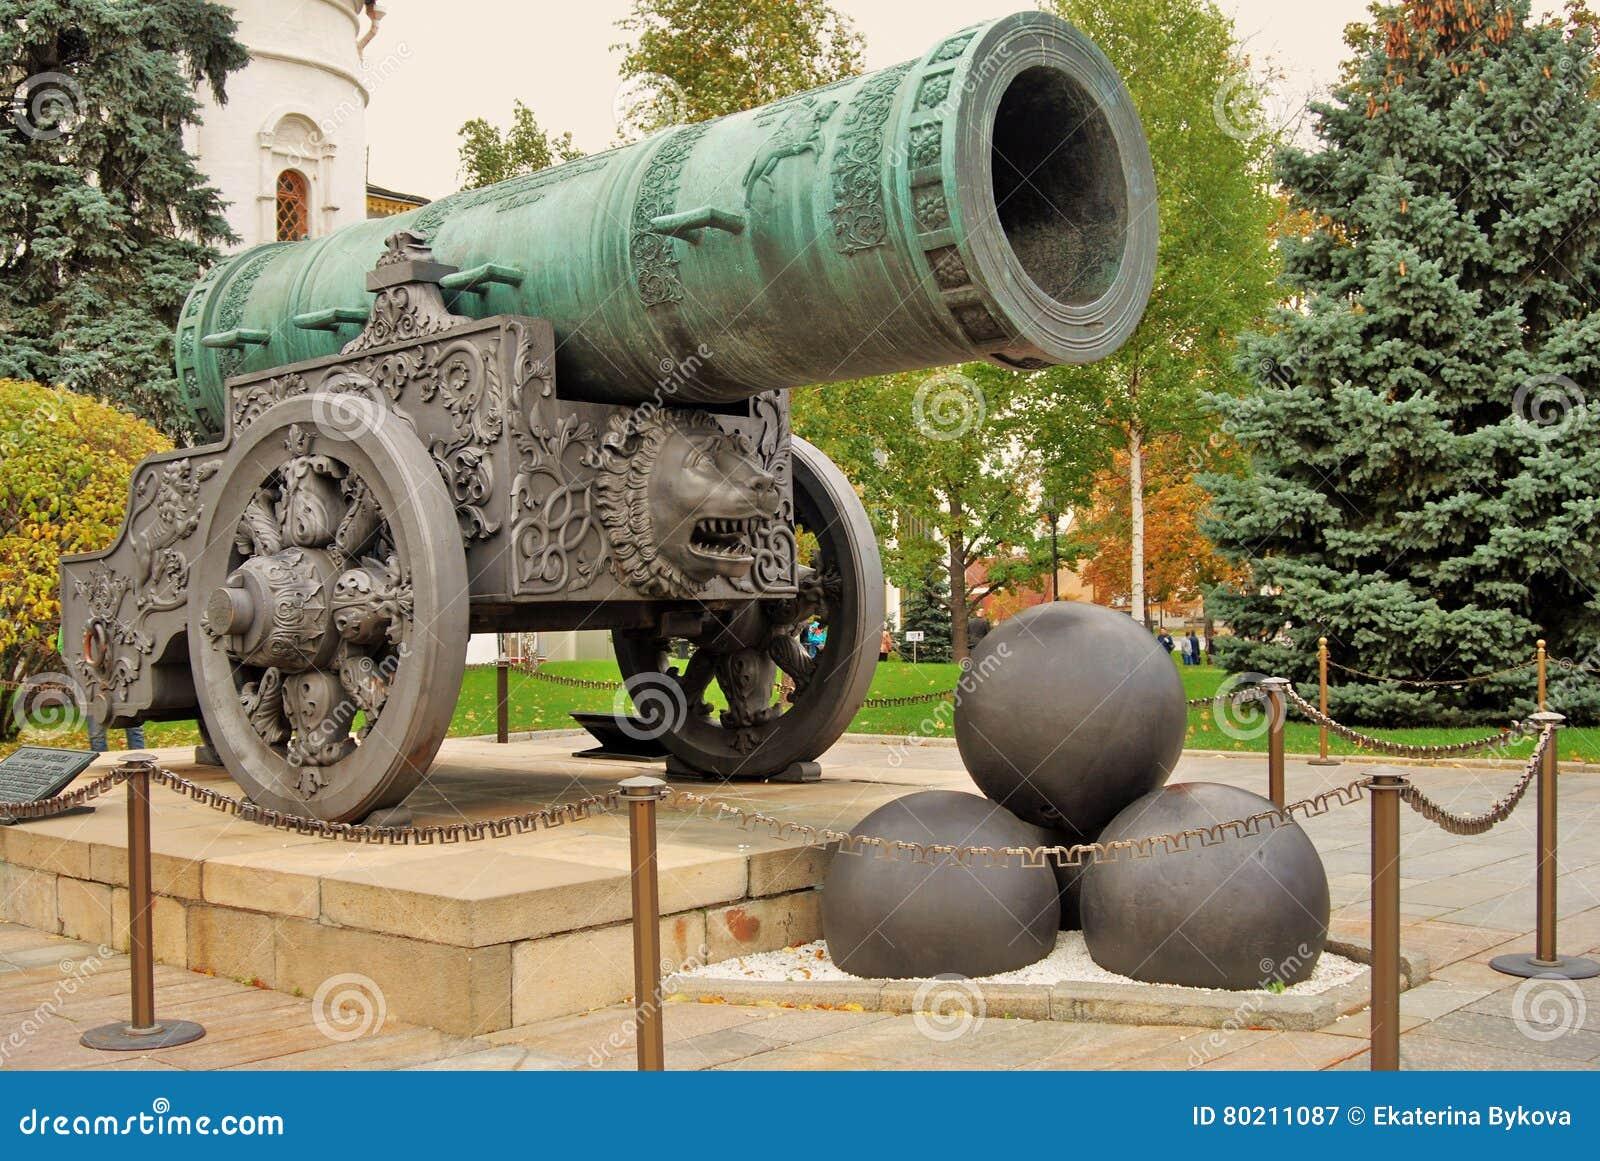 Koning Cannon in Moskou het Kremlin Kleurenfoto